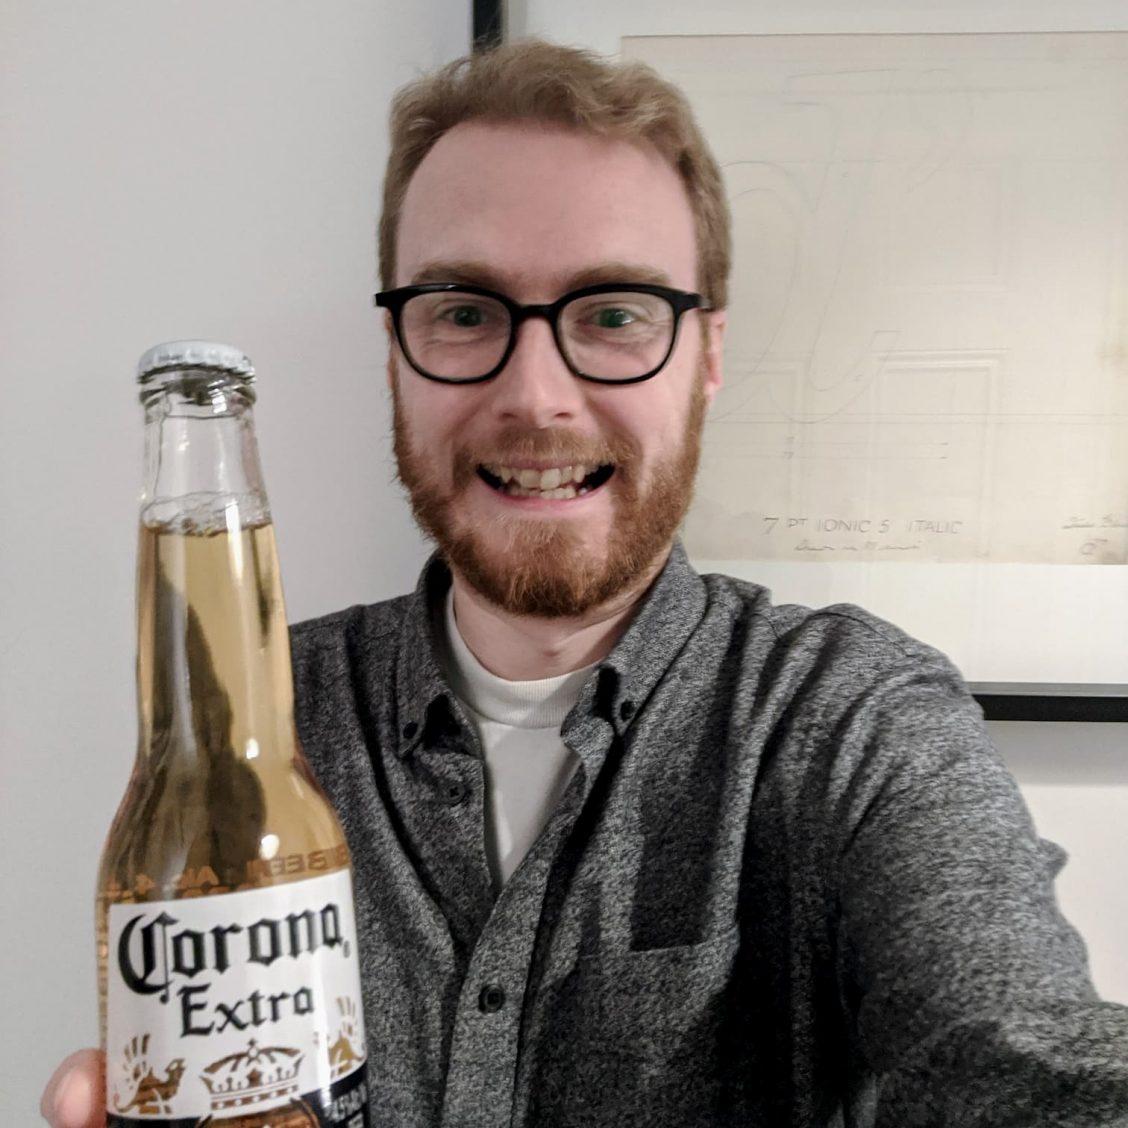 Me holding a bottle of Corona